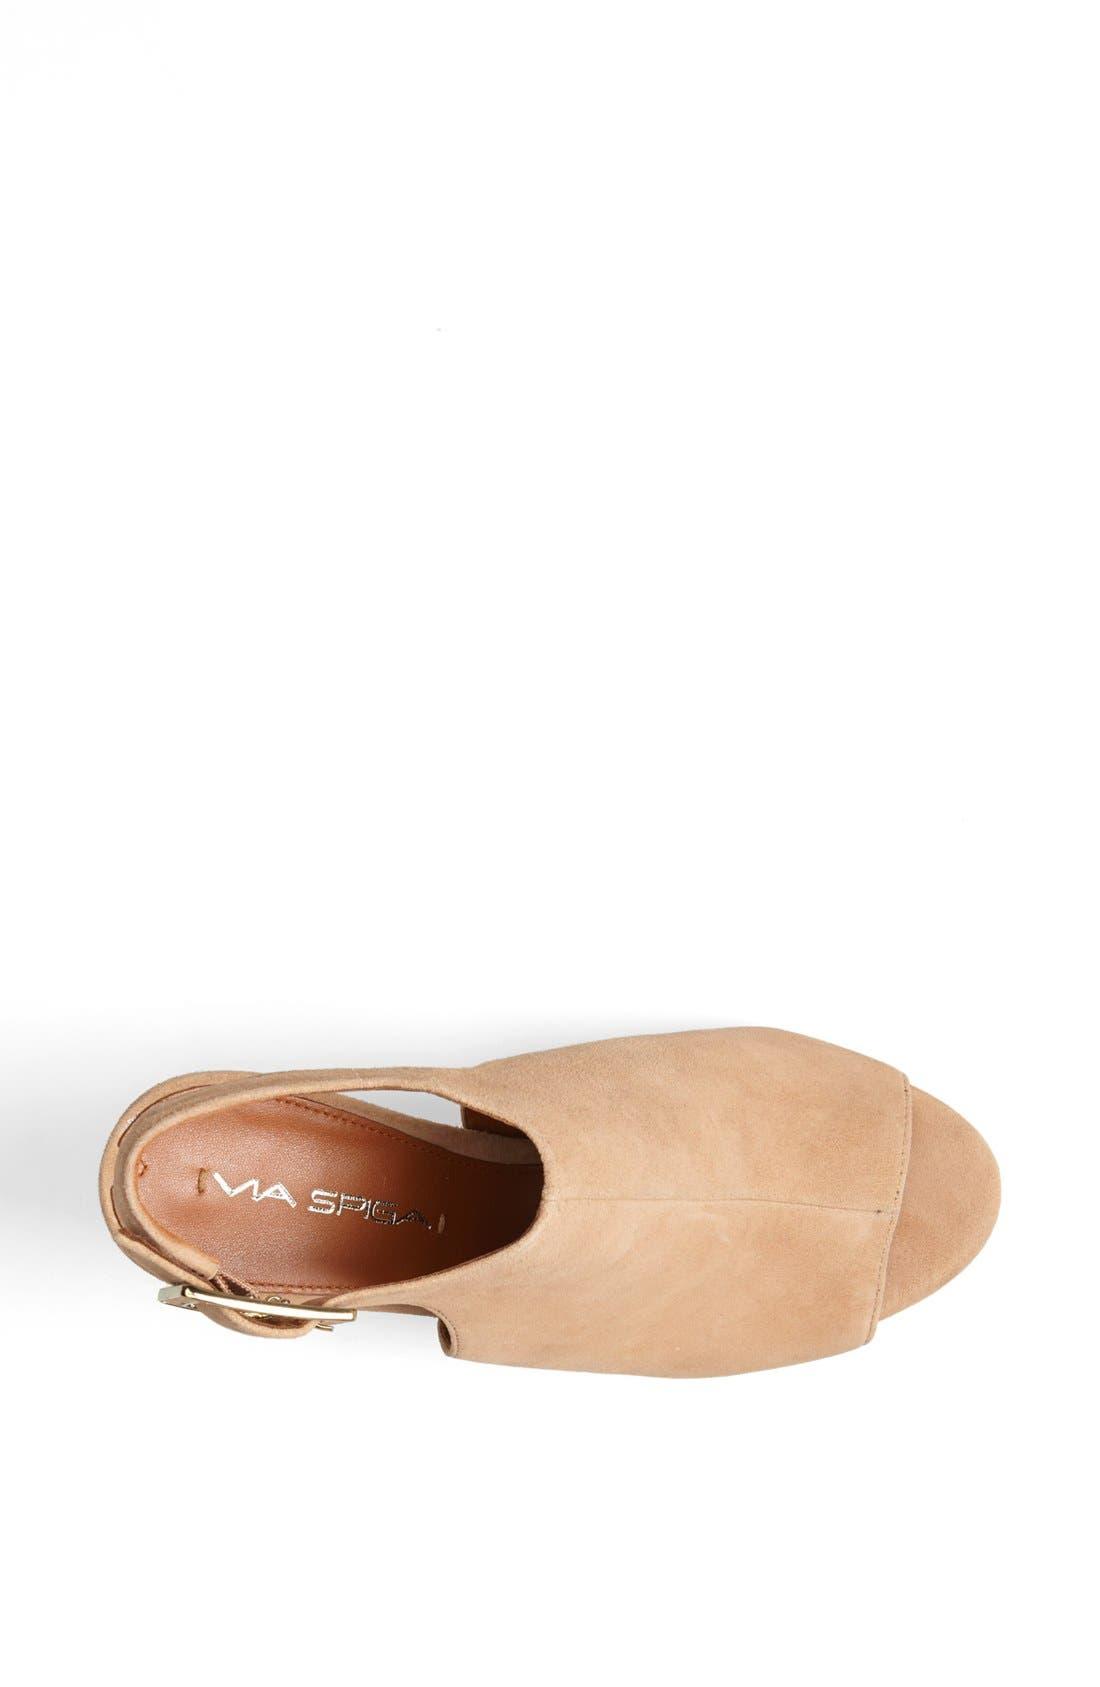 Alternate Image 3  - Via Spiga 'Nino' Ankle Strap Sandal